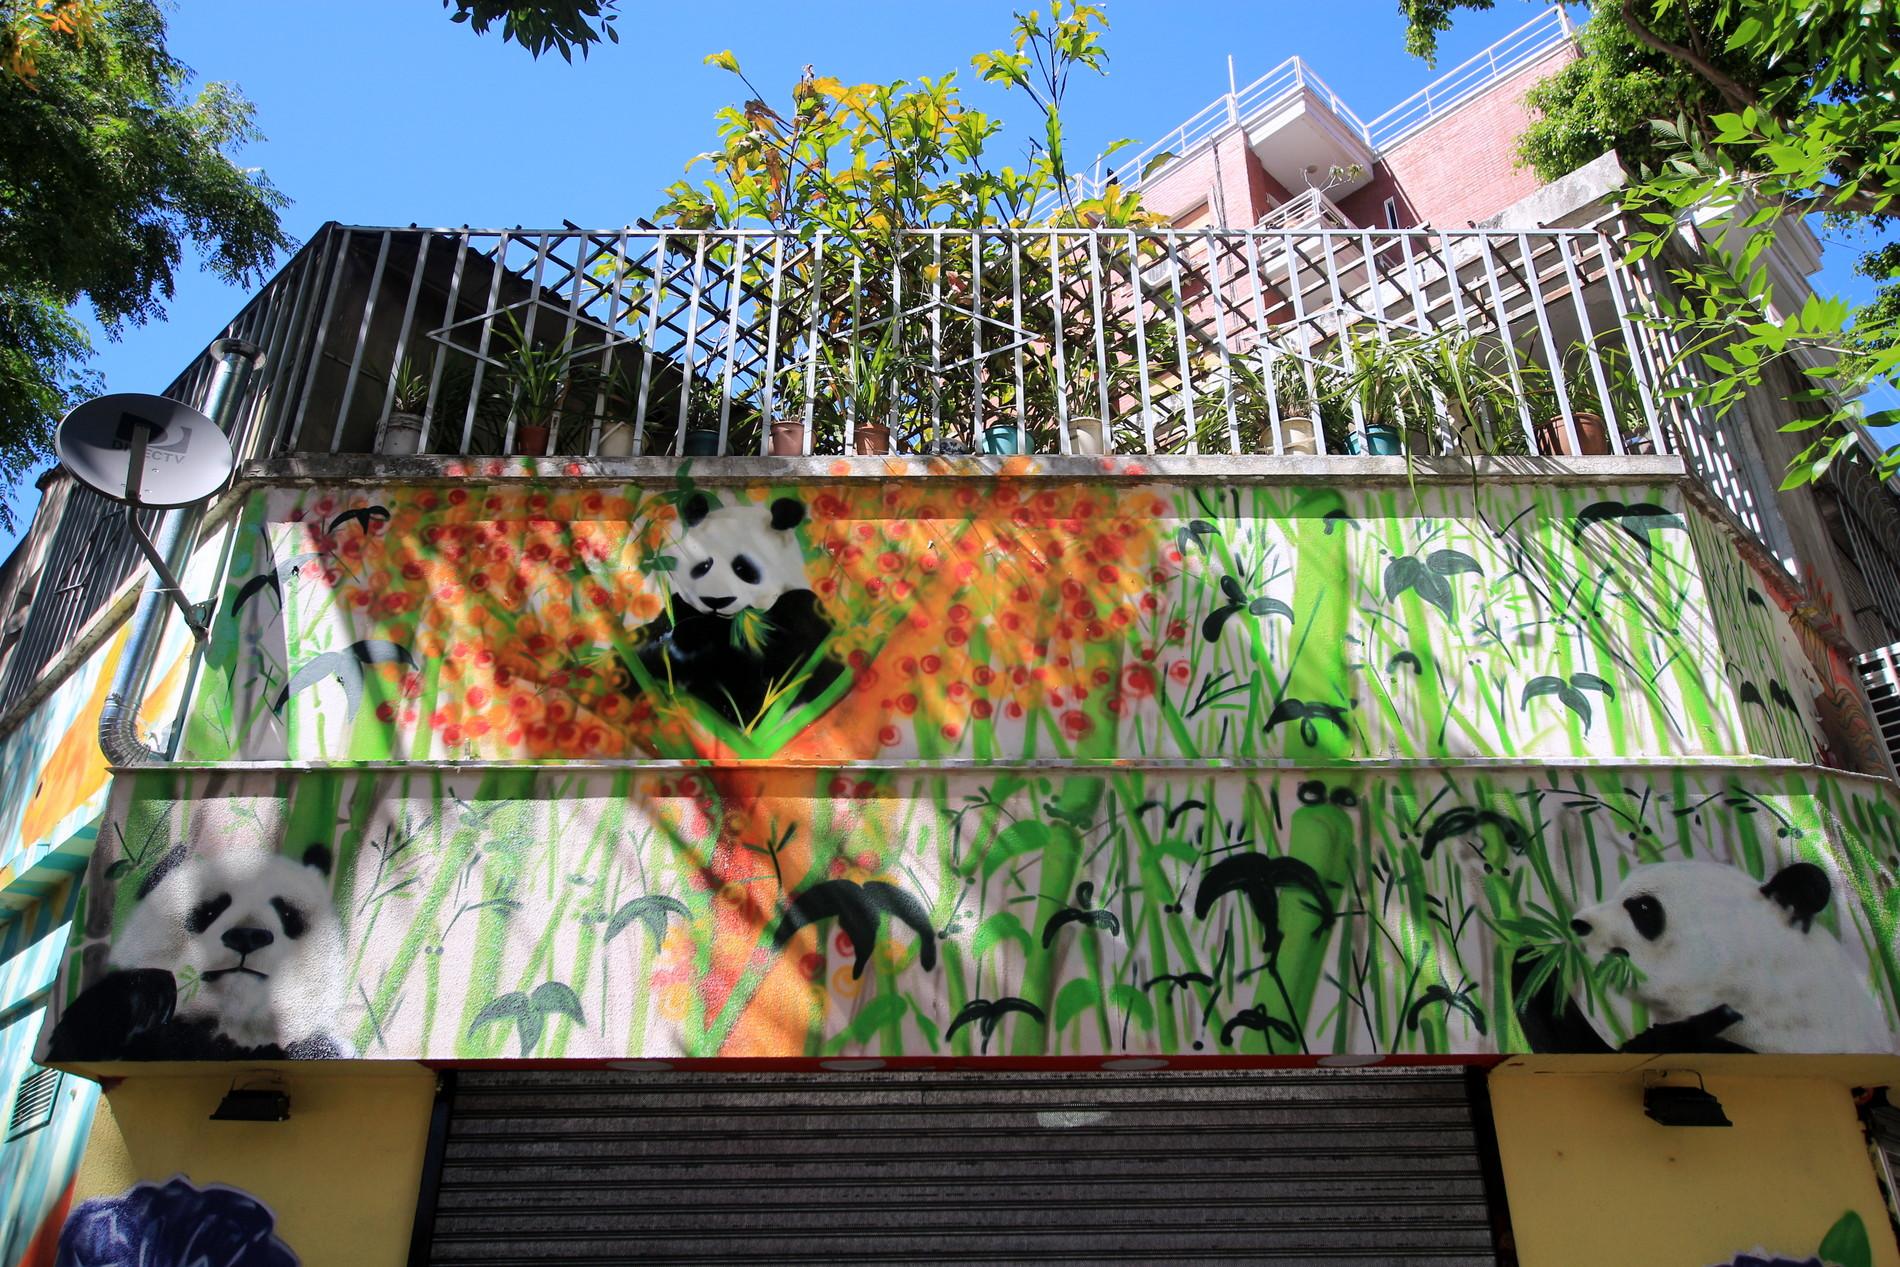 belgrano street art graffiti barrio chino buenos aires pandas arte callejero ba street art buenosairesstreetart.com